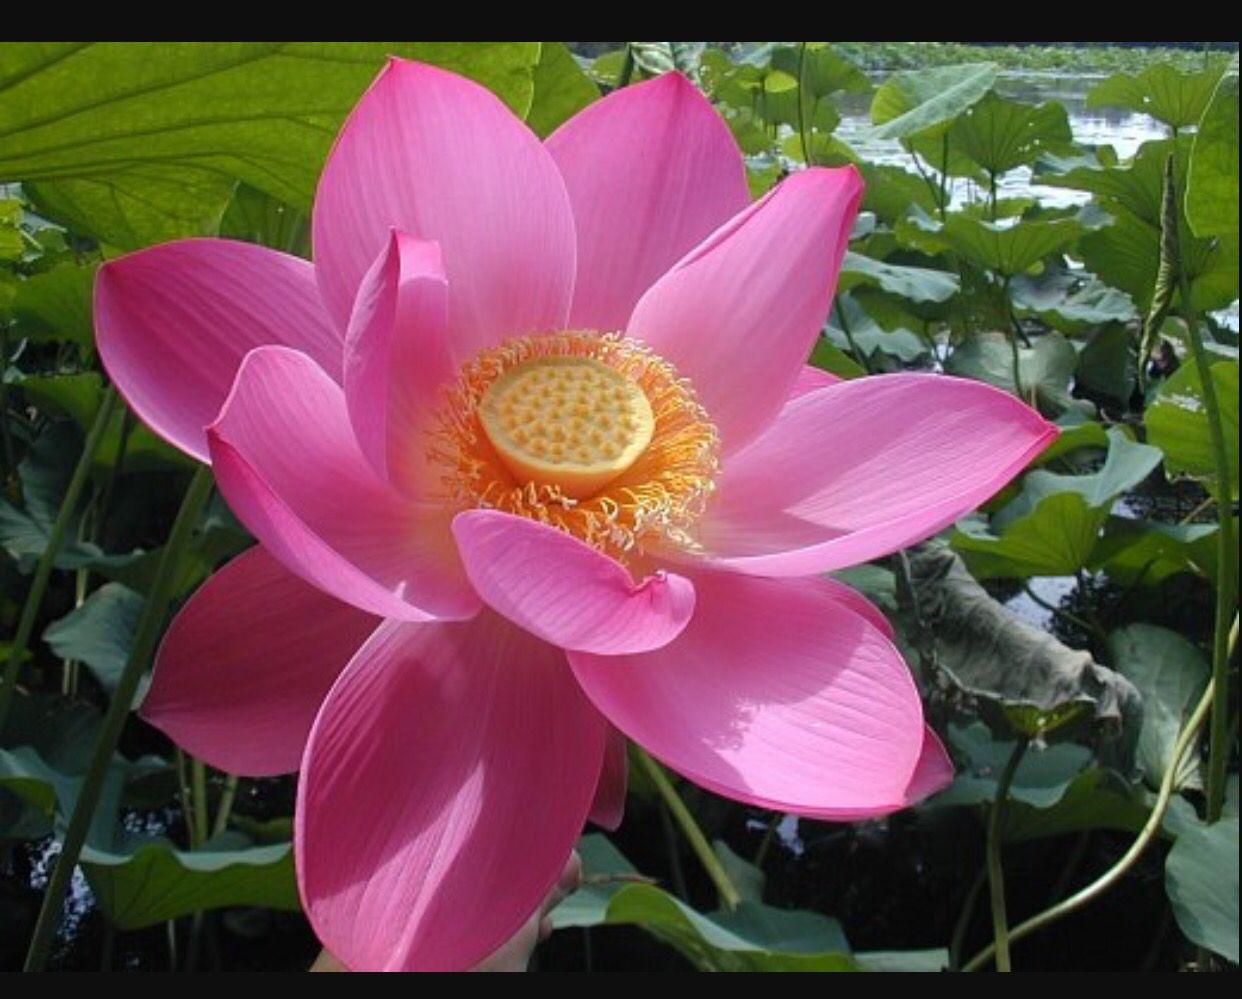 Pin by conner isa on lotus tattoo pinterest lotus tattoo sacred lotus flower common name sacred l otus indian lotus scientific name nelumbo n ucifera height m growth ra mightylinksfo